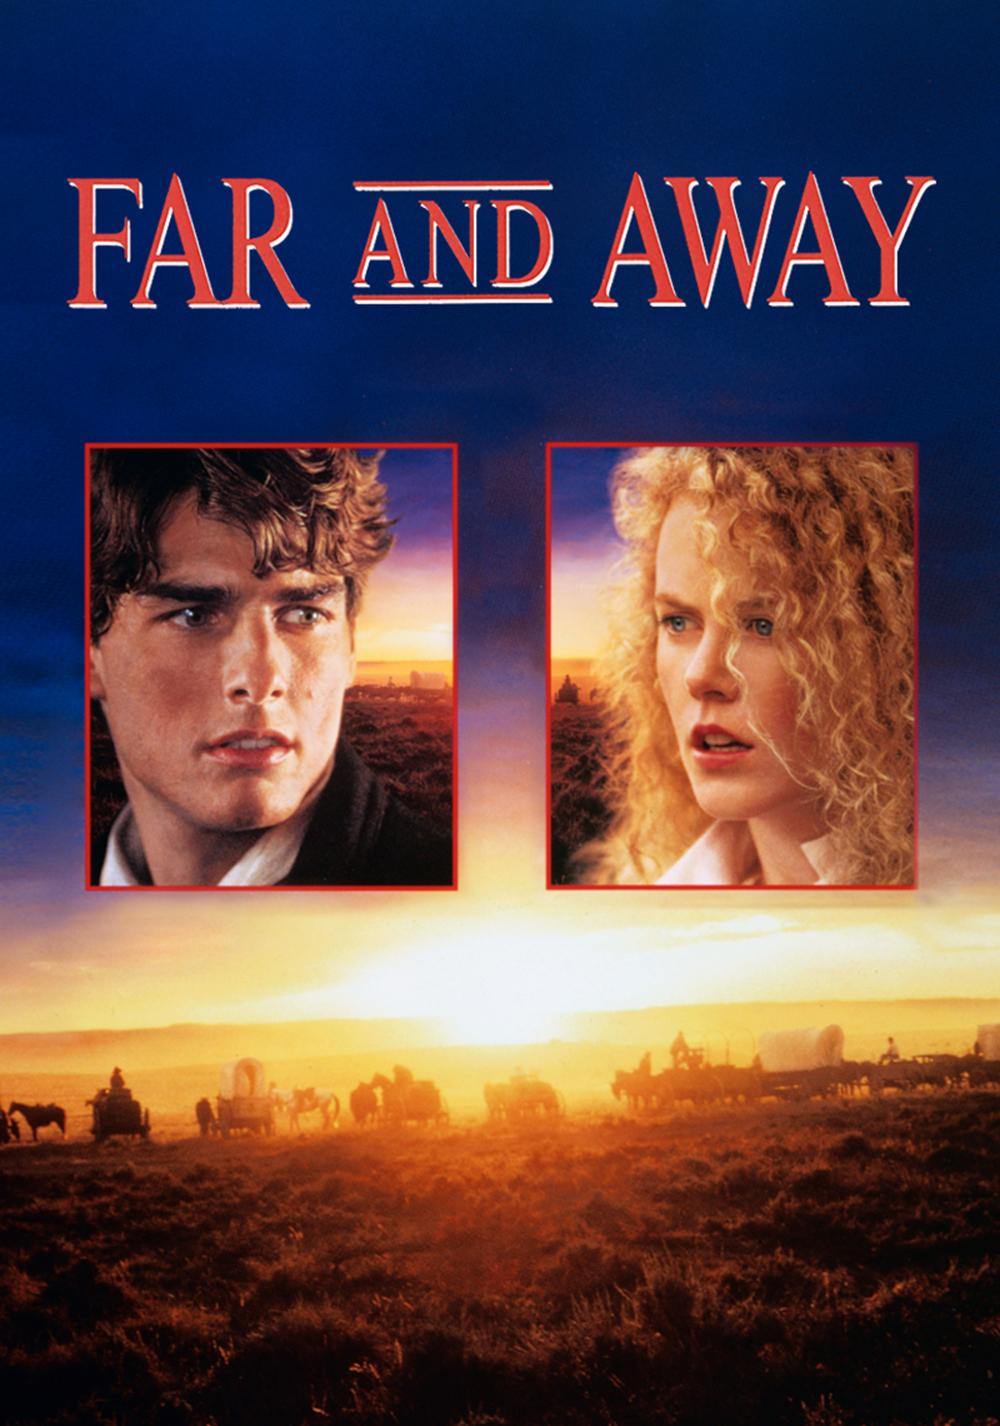 far and away movie fanart fanarttv